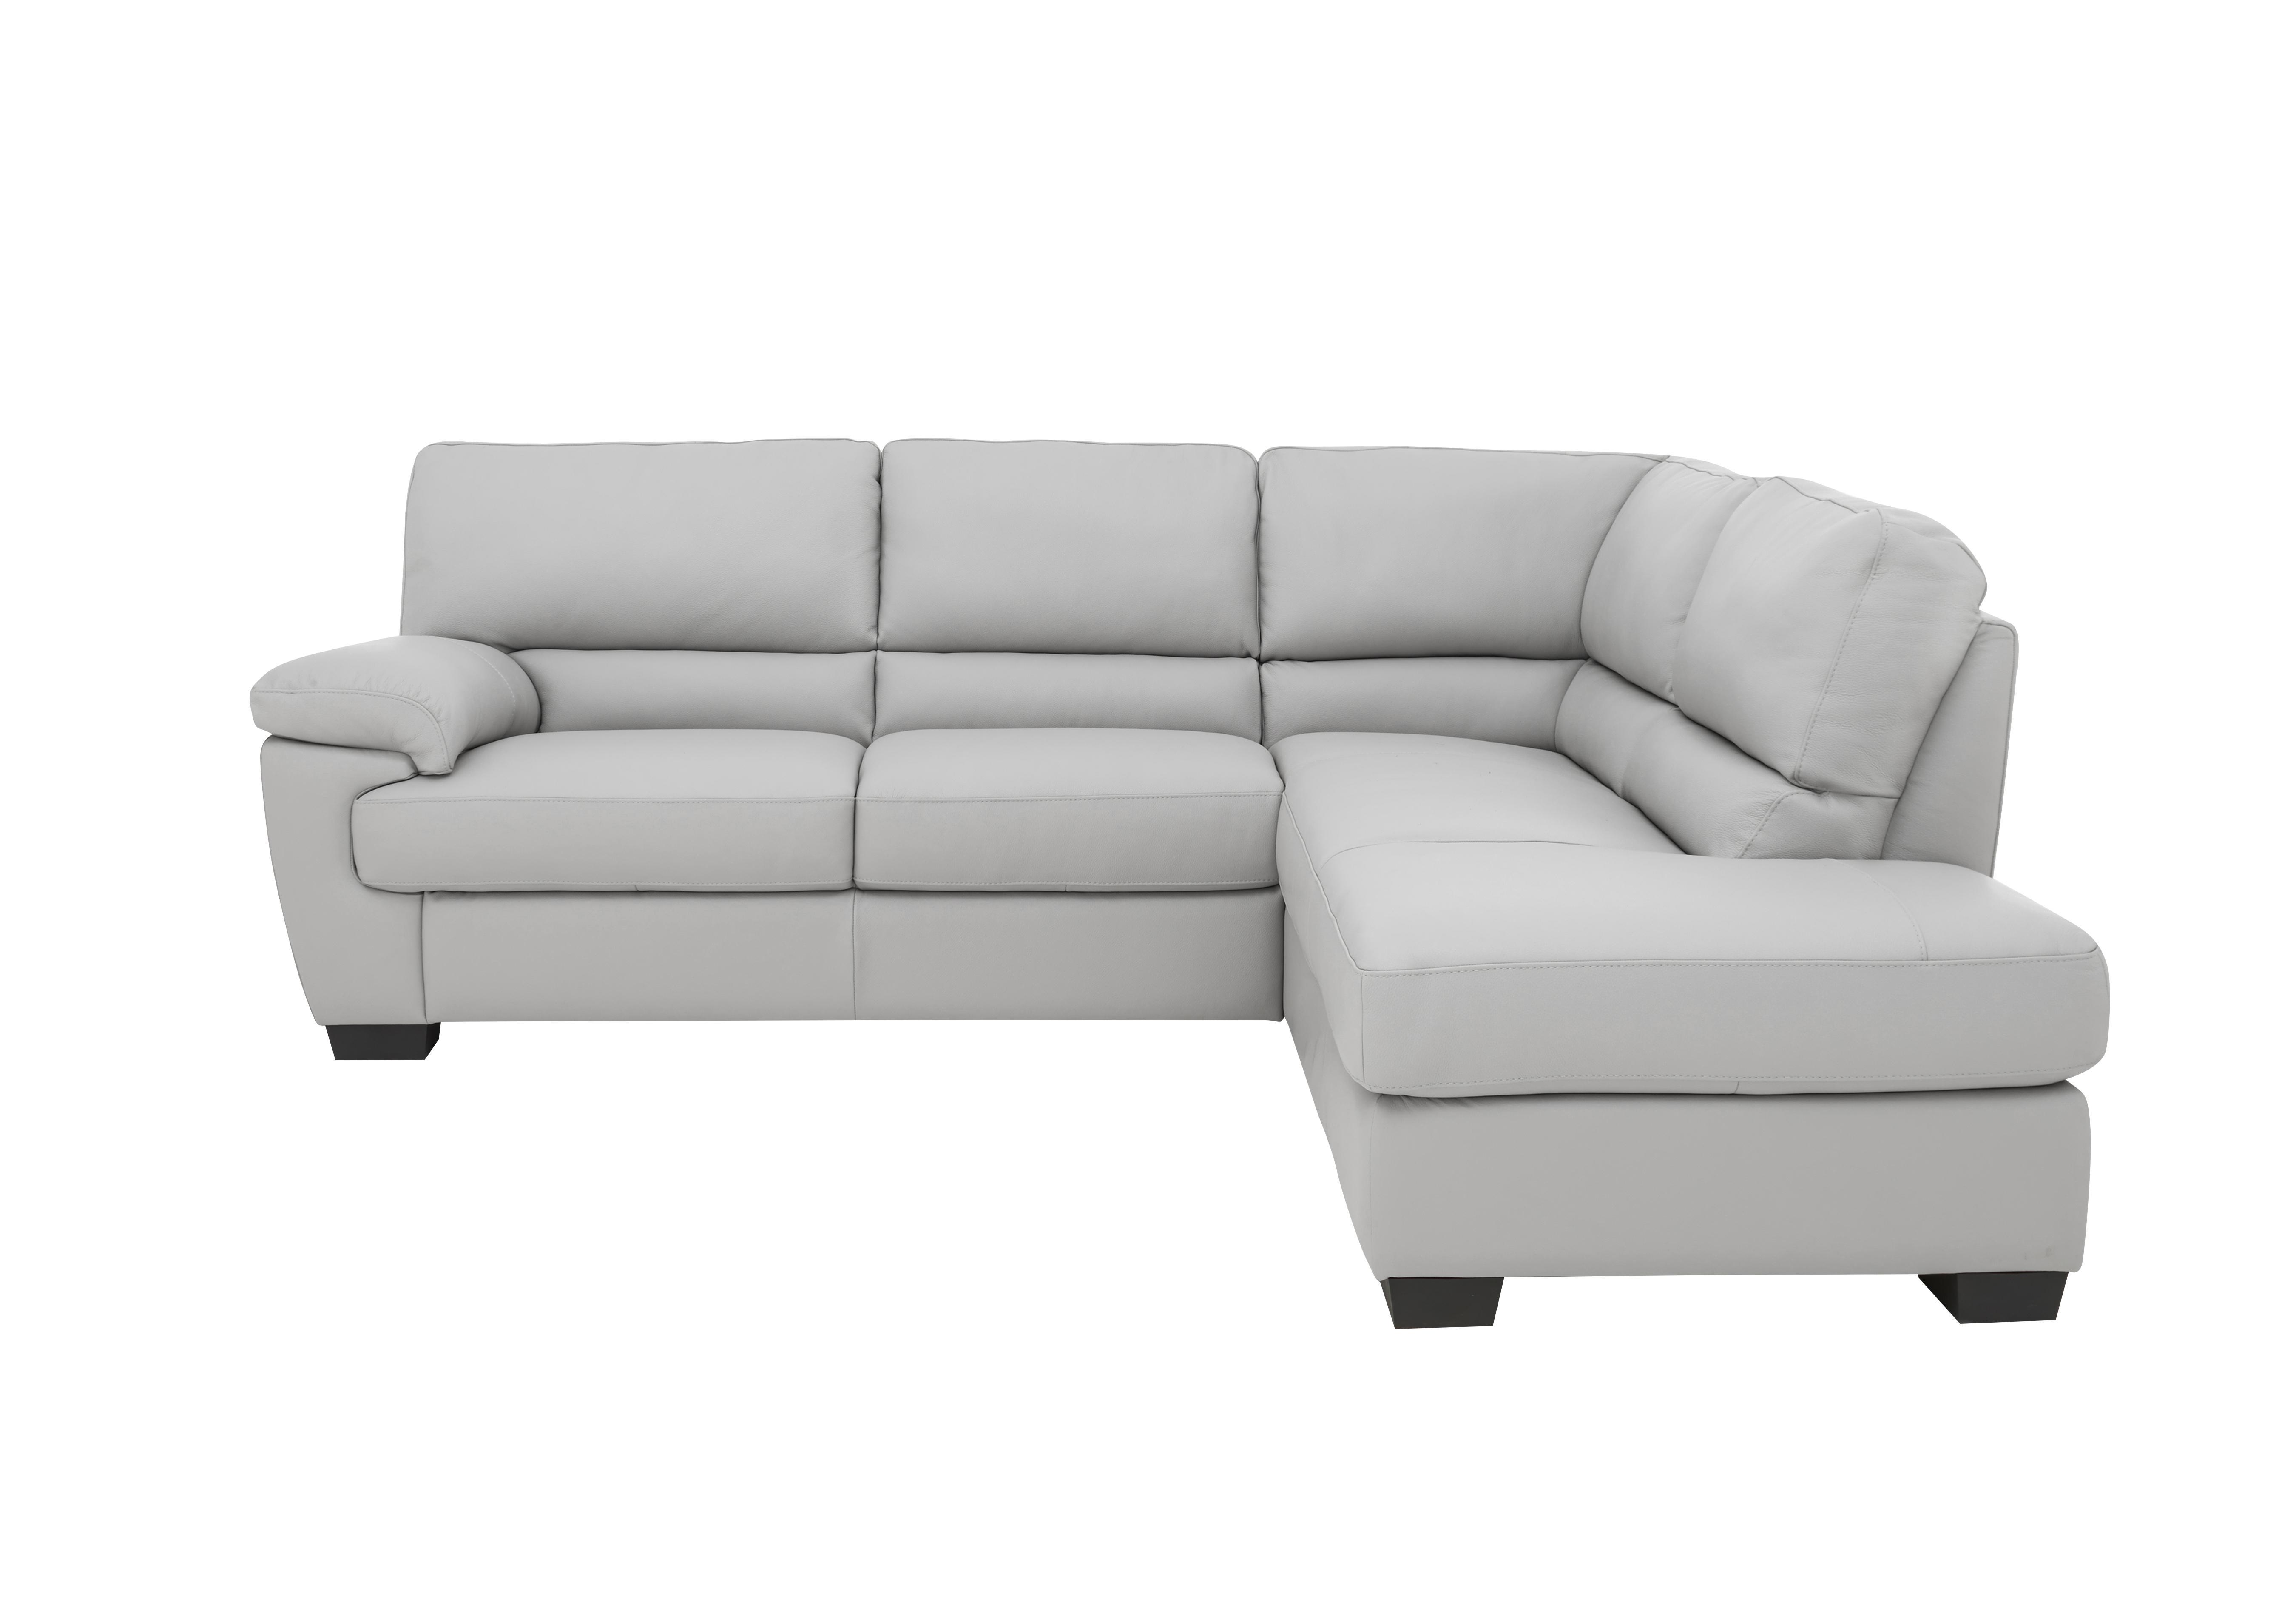 furniture village leather corner sofa bed extra tall table lazio